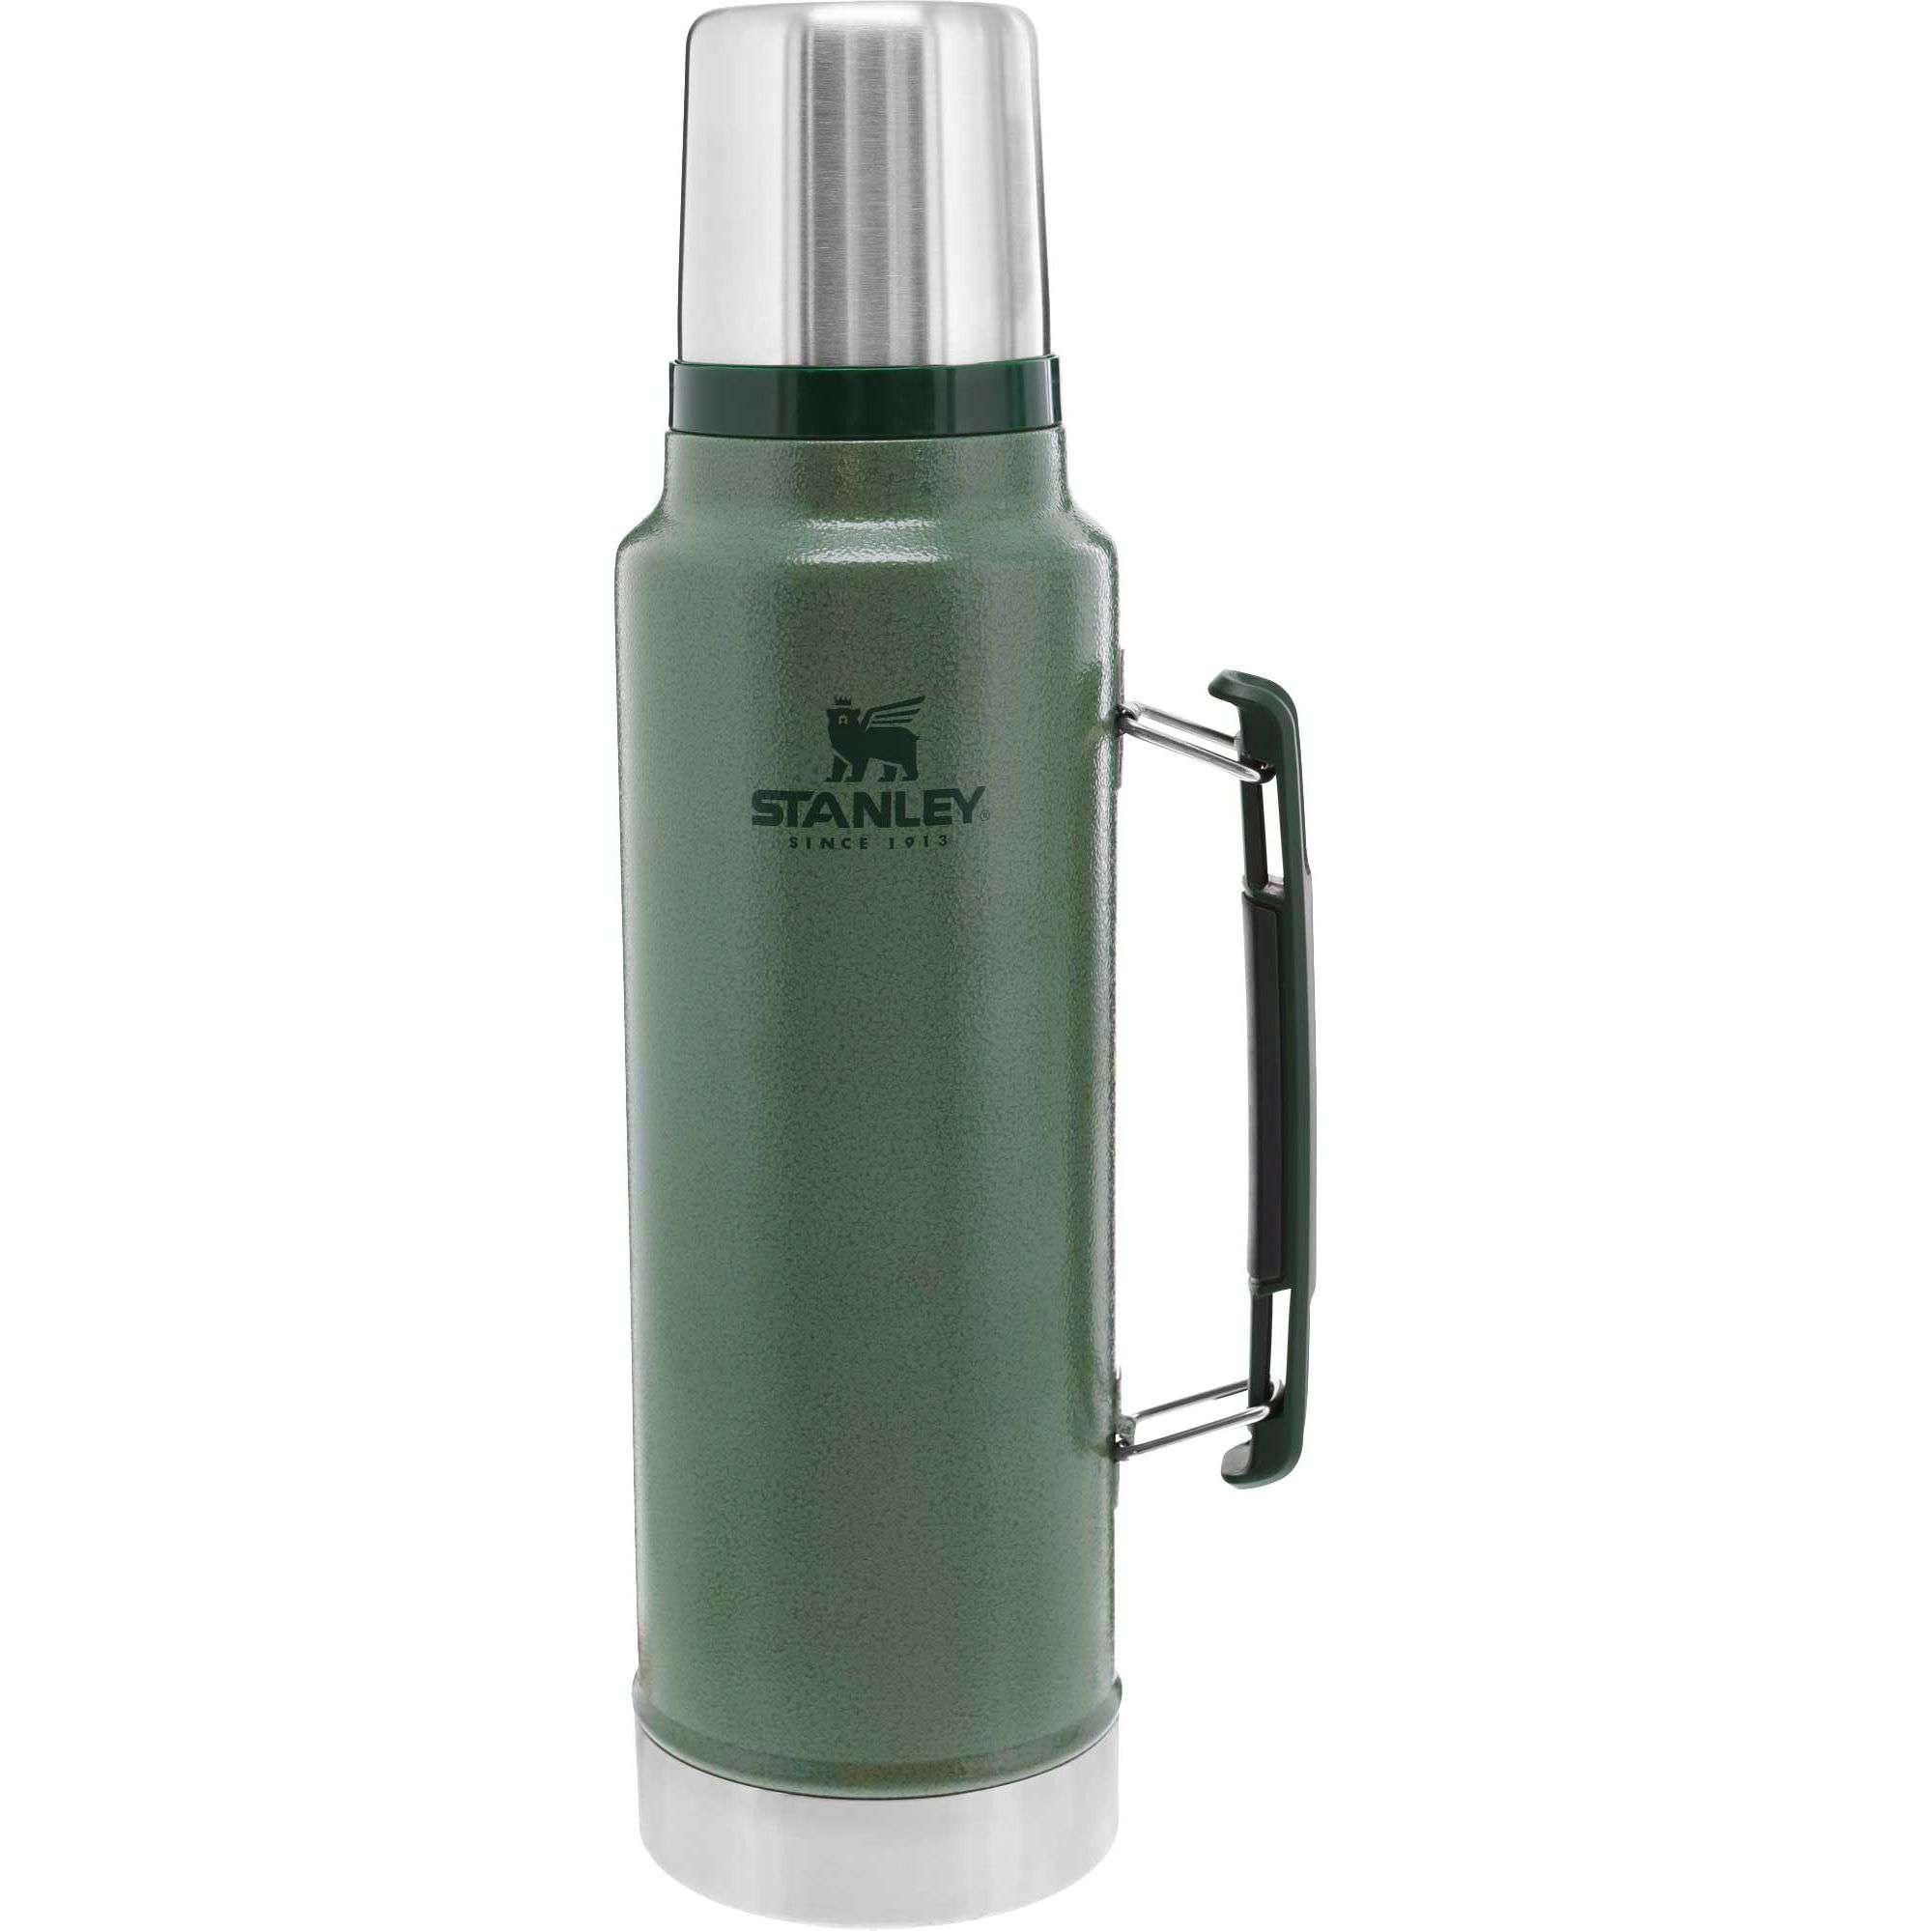 Stanley Classic Legendary Vacuum Insulated Bottle